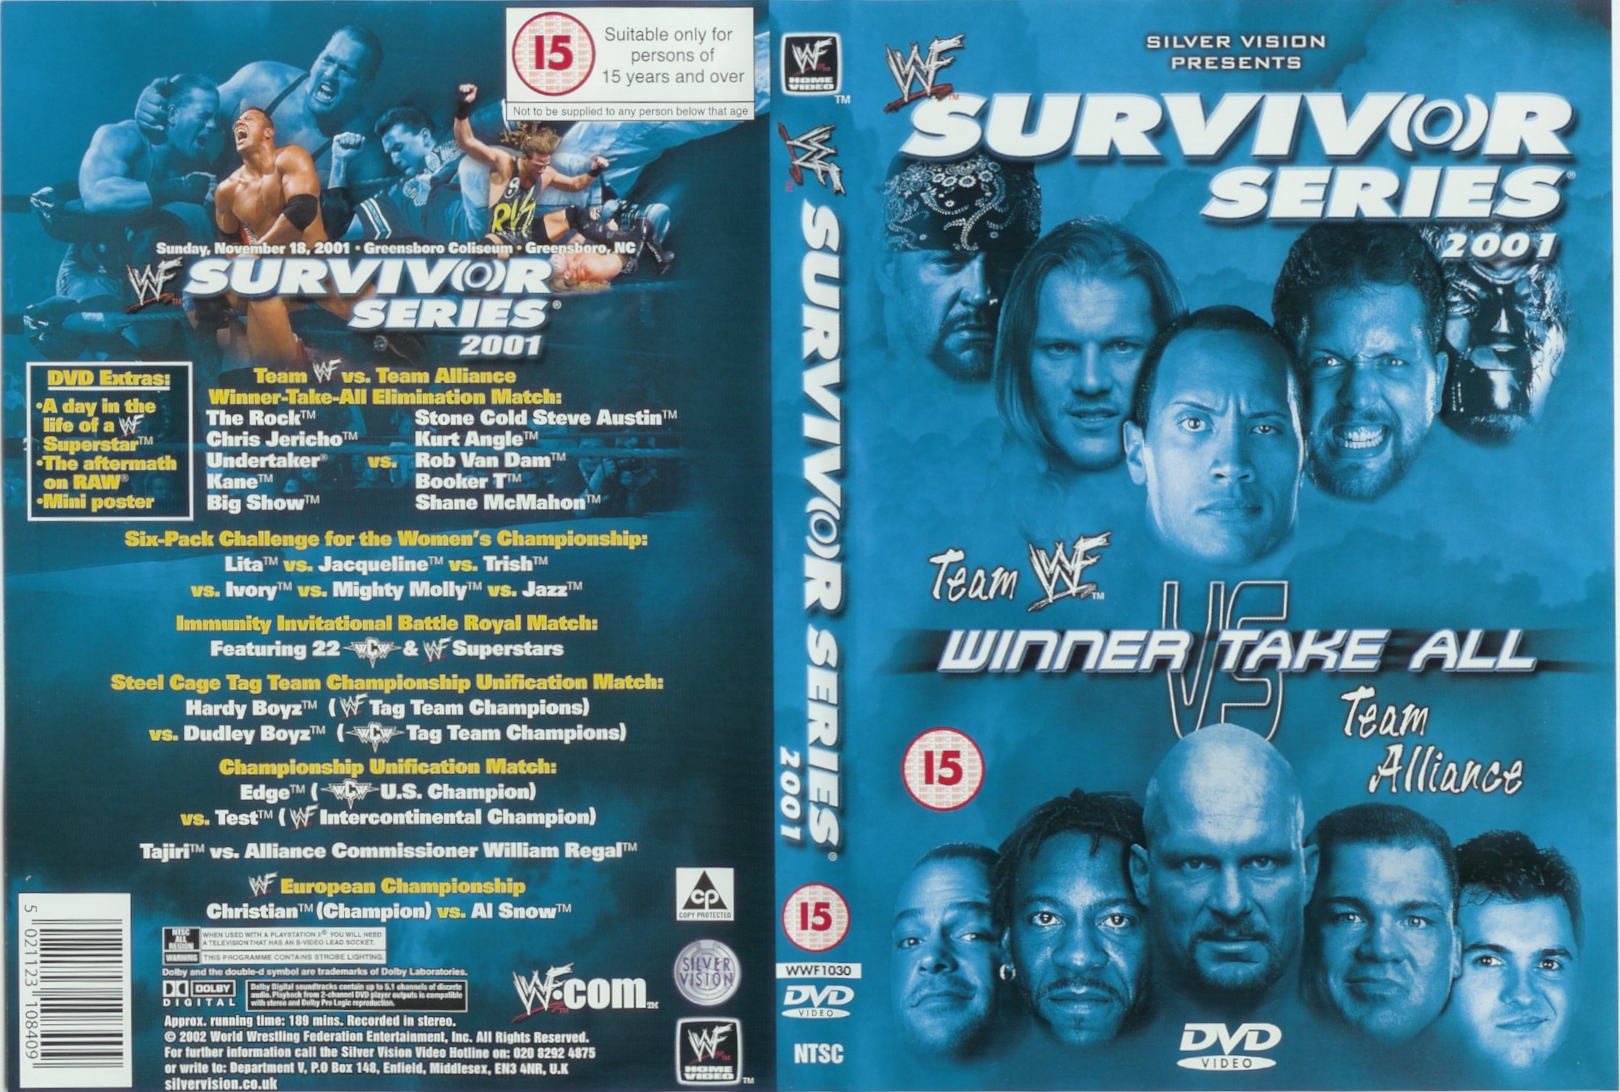 WWE Survior Series 2001